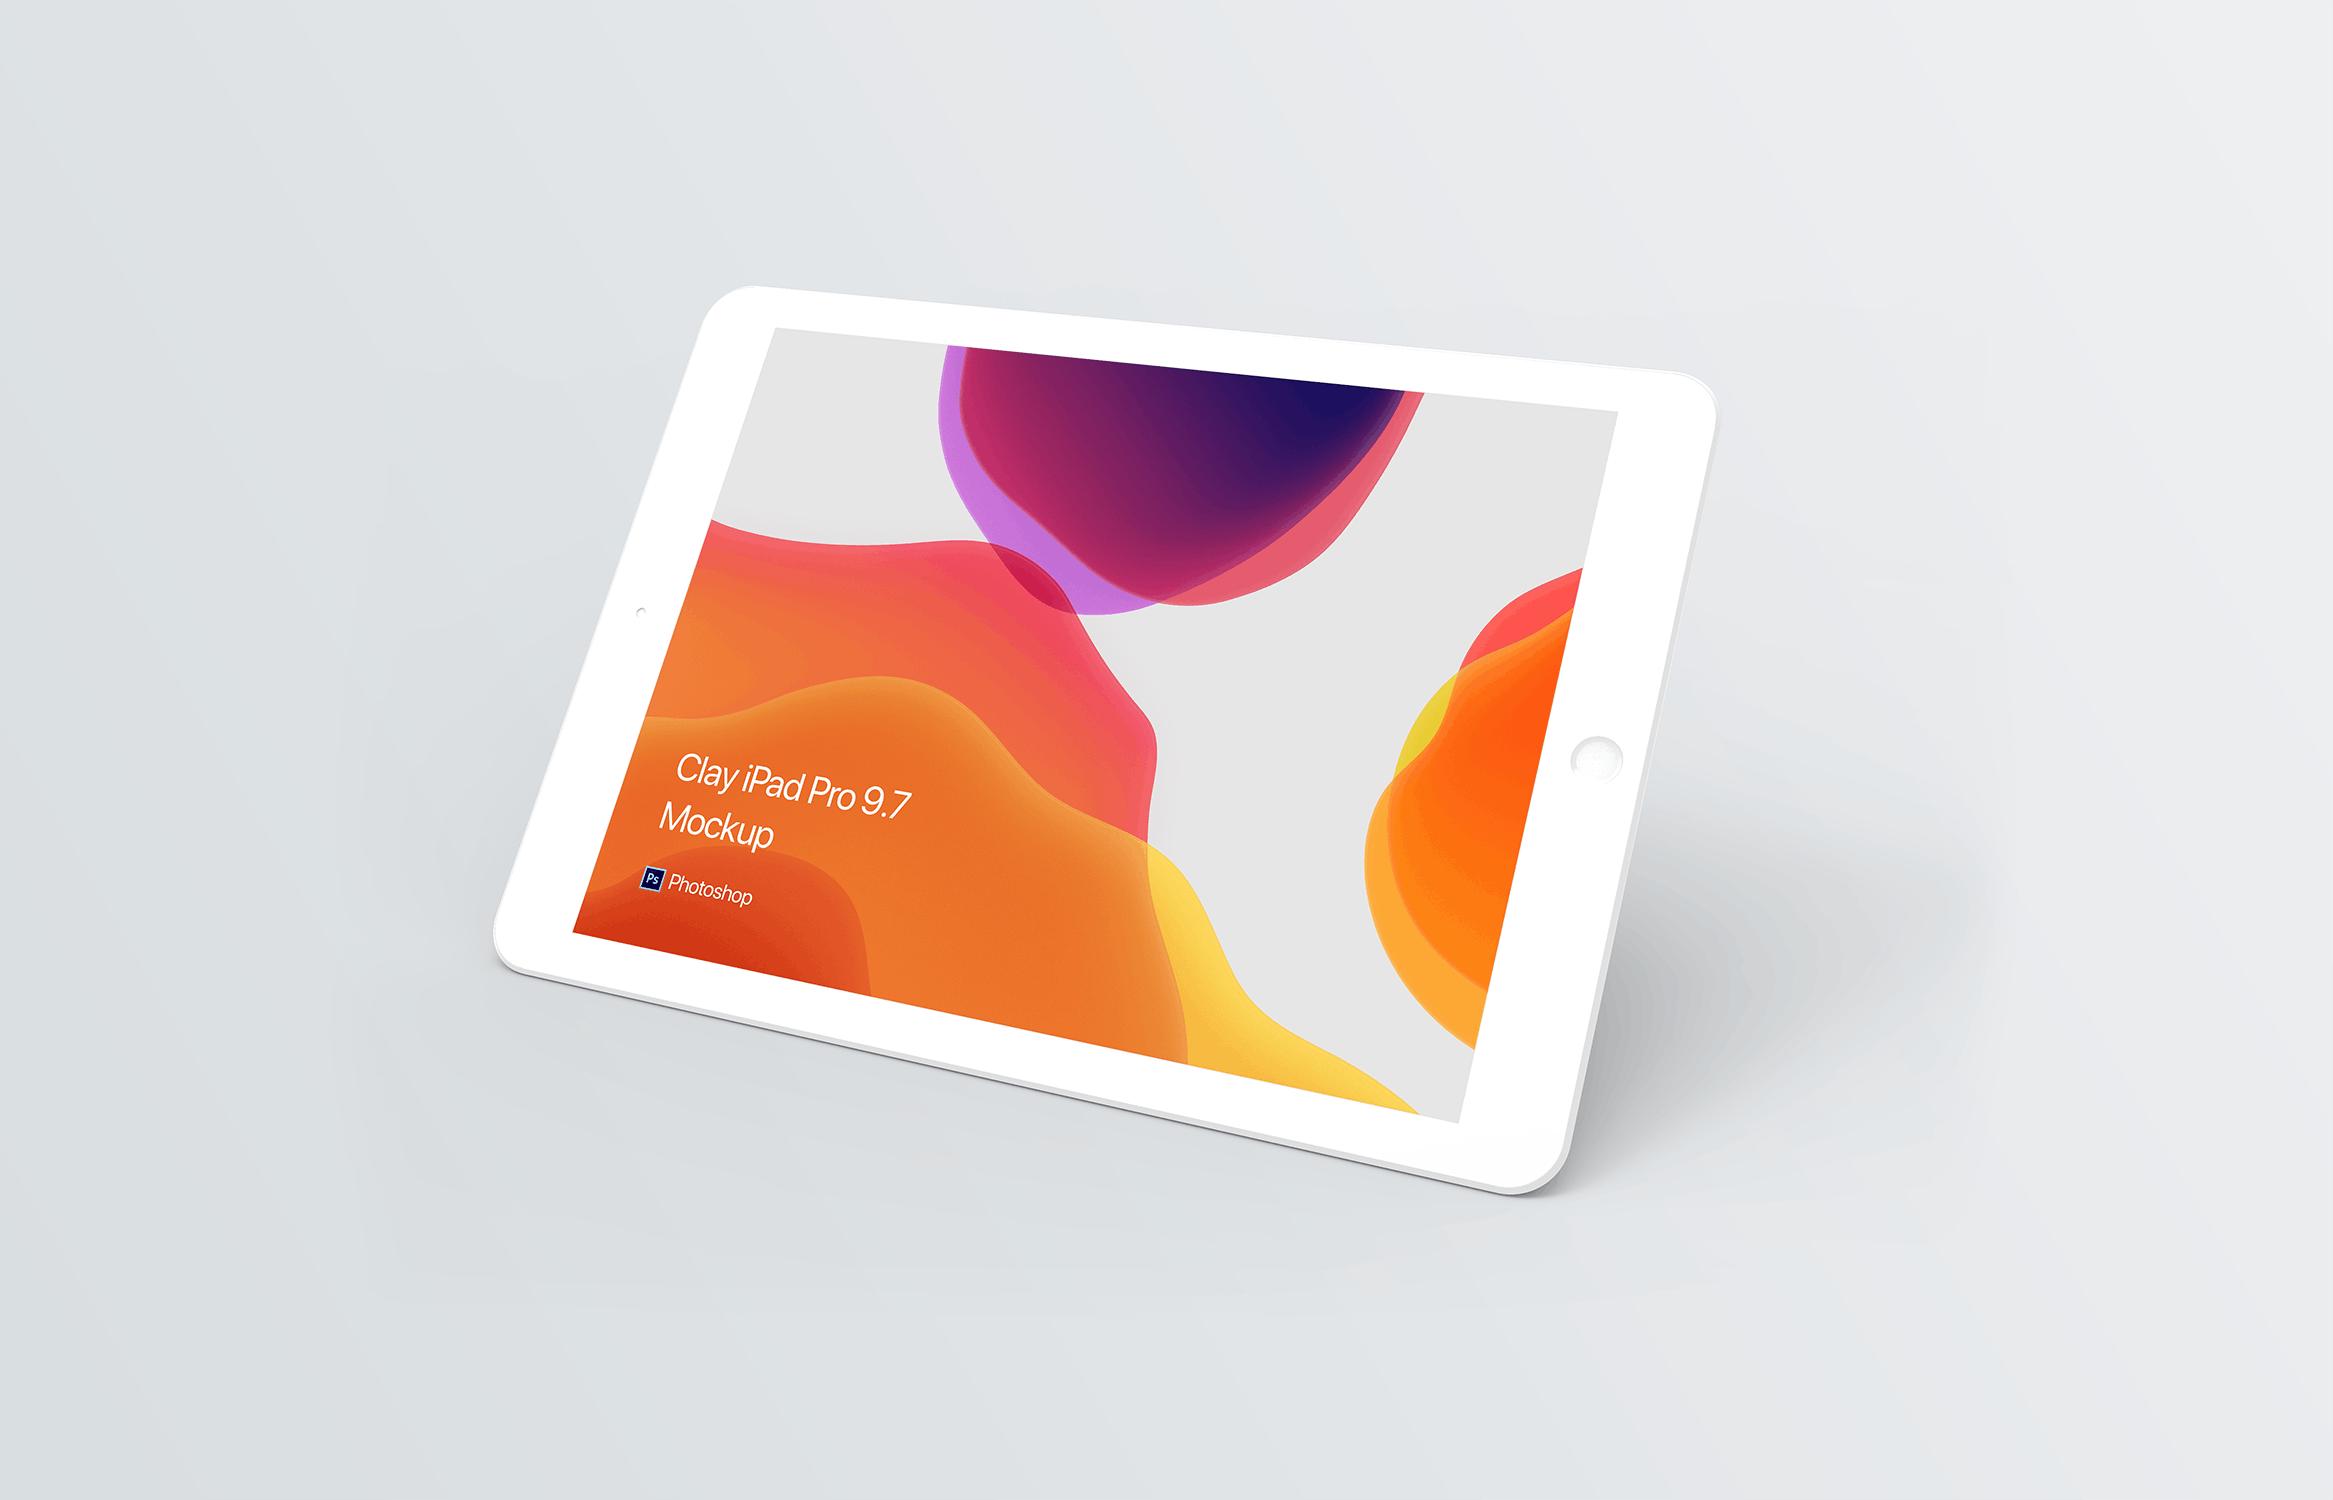 iPad样机苹果平板电脑素材模板样机展示Clay iPad Mockup